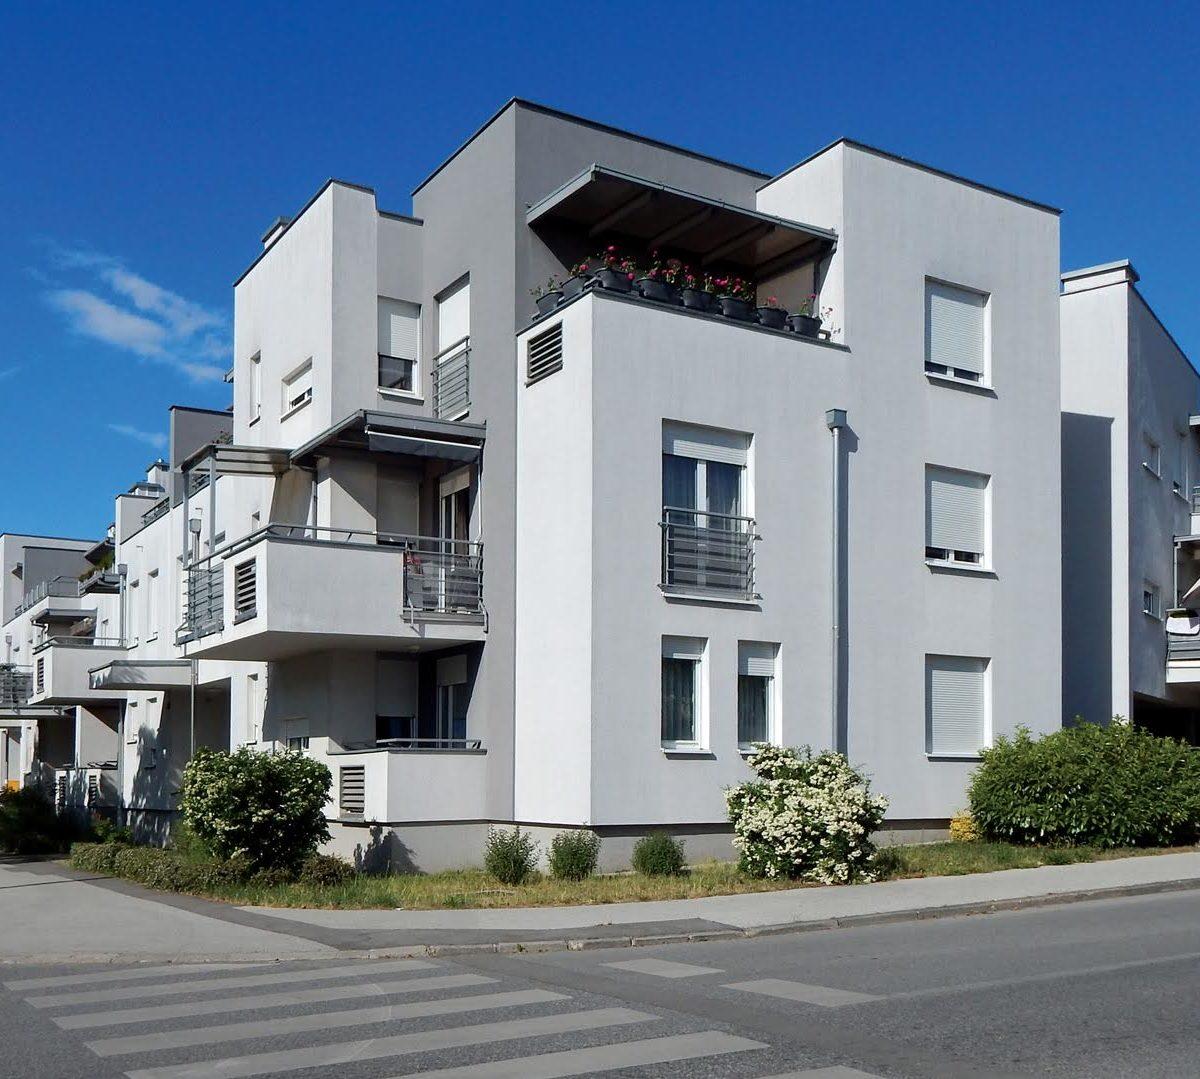 Arhitektura zagrebačkih četvrti: Trešnjevka/od postmodernizma do novog ornamentalizma